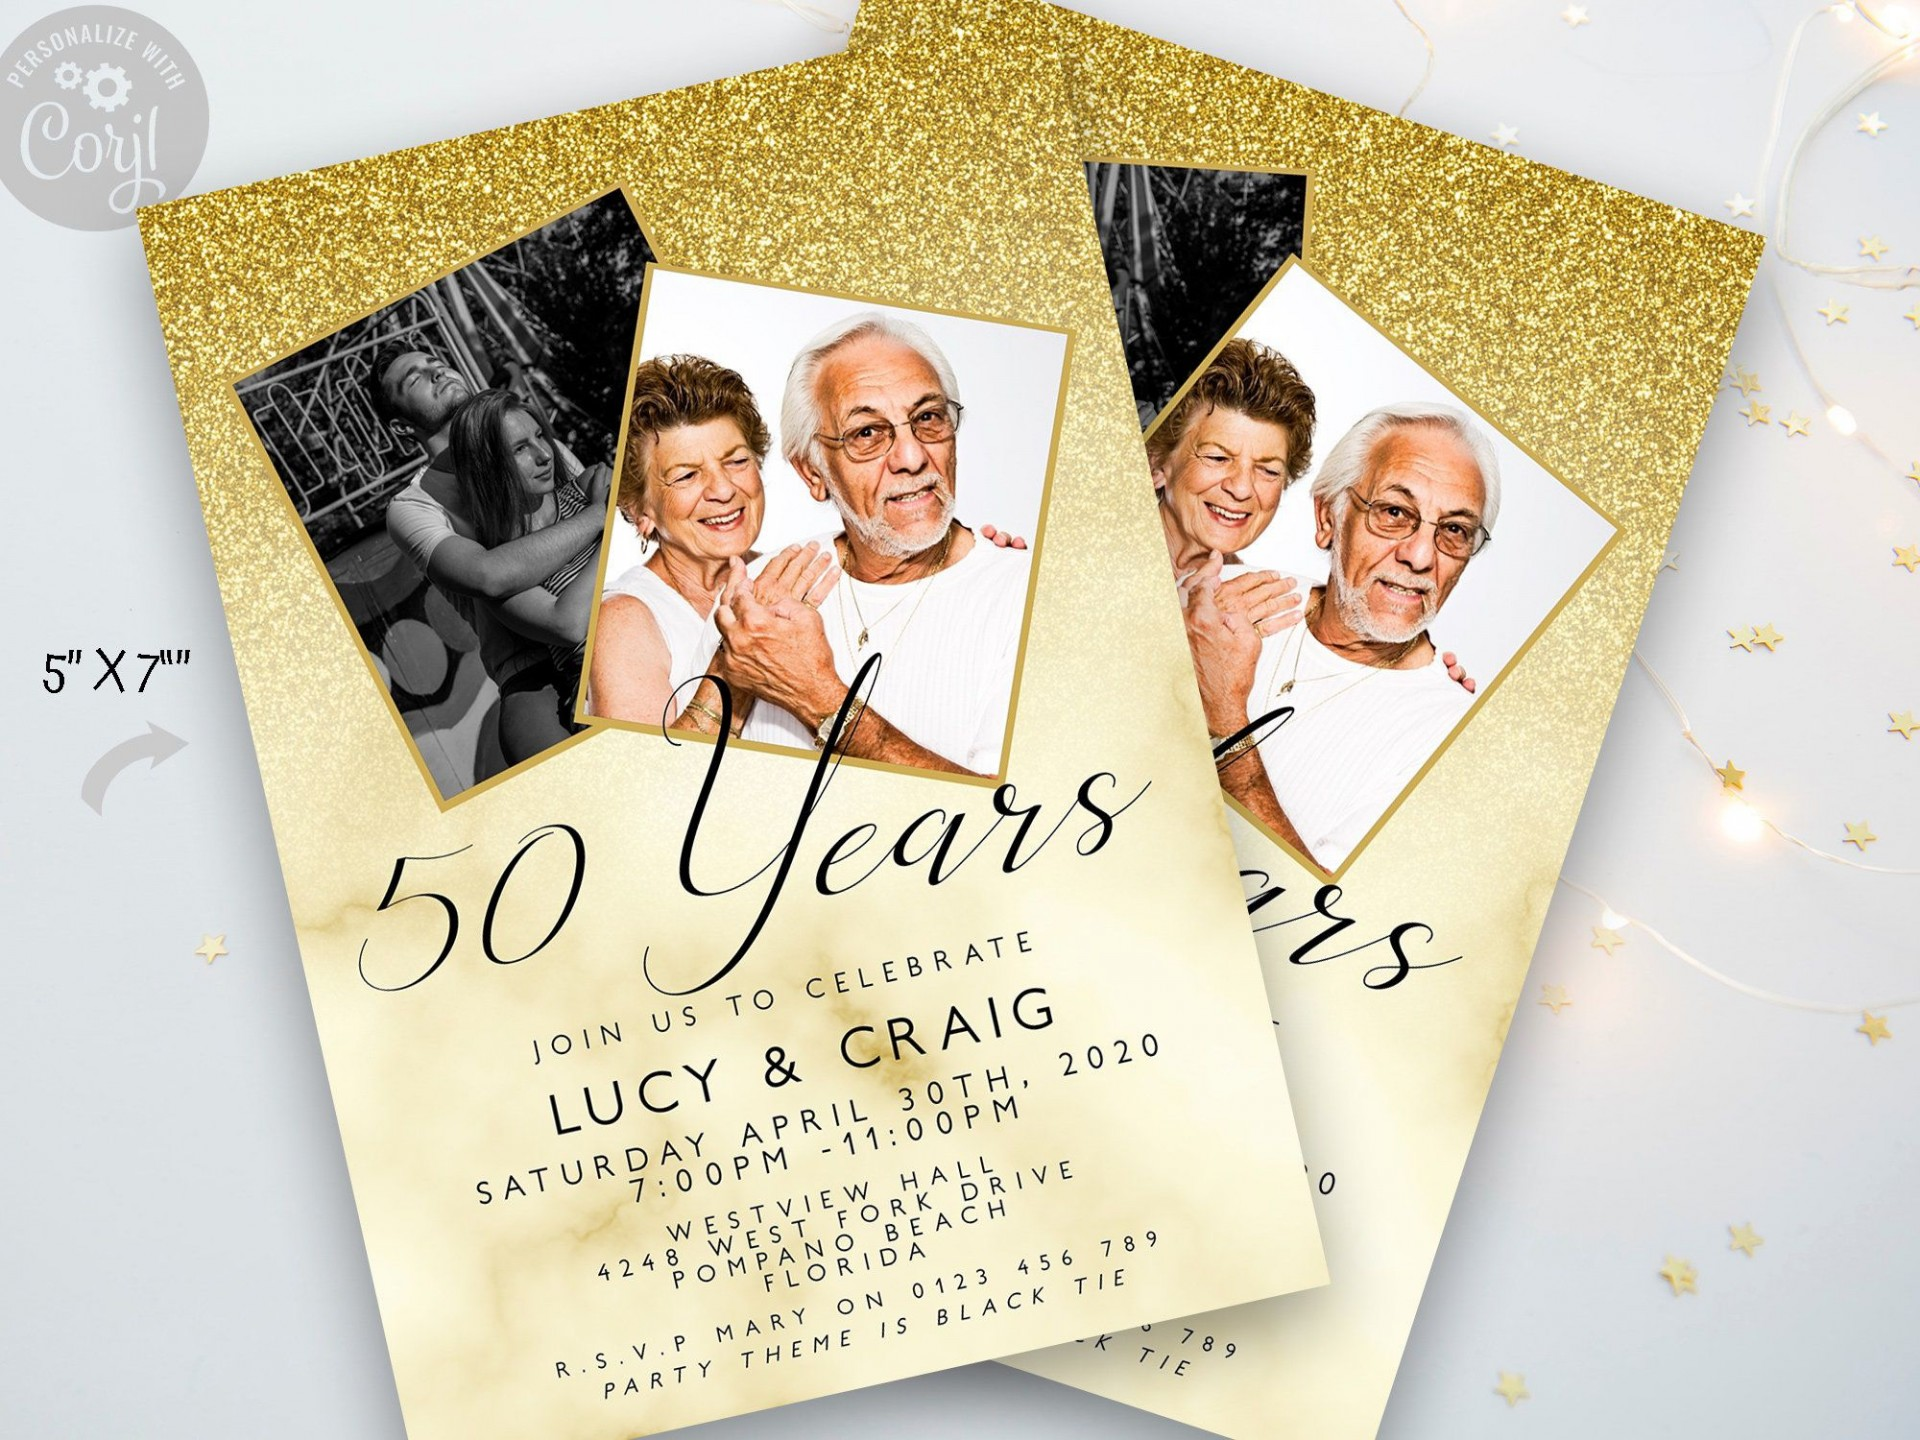 006 Rare 50th Anniversary Party Invitation Template Sample  Templates Golden Wedding Uk Microsoft Word Free1920